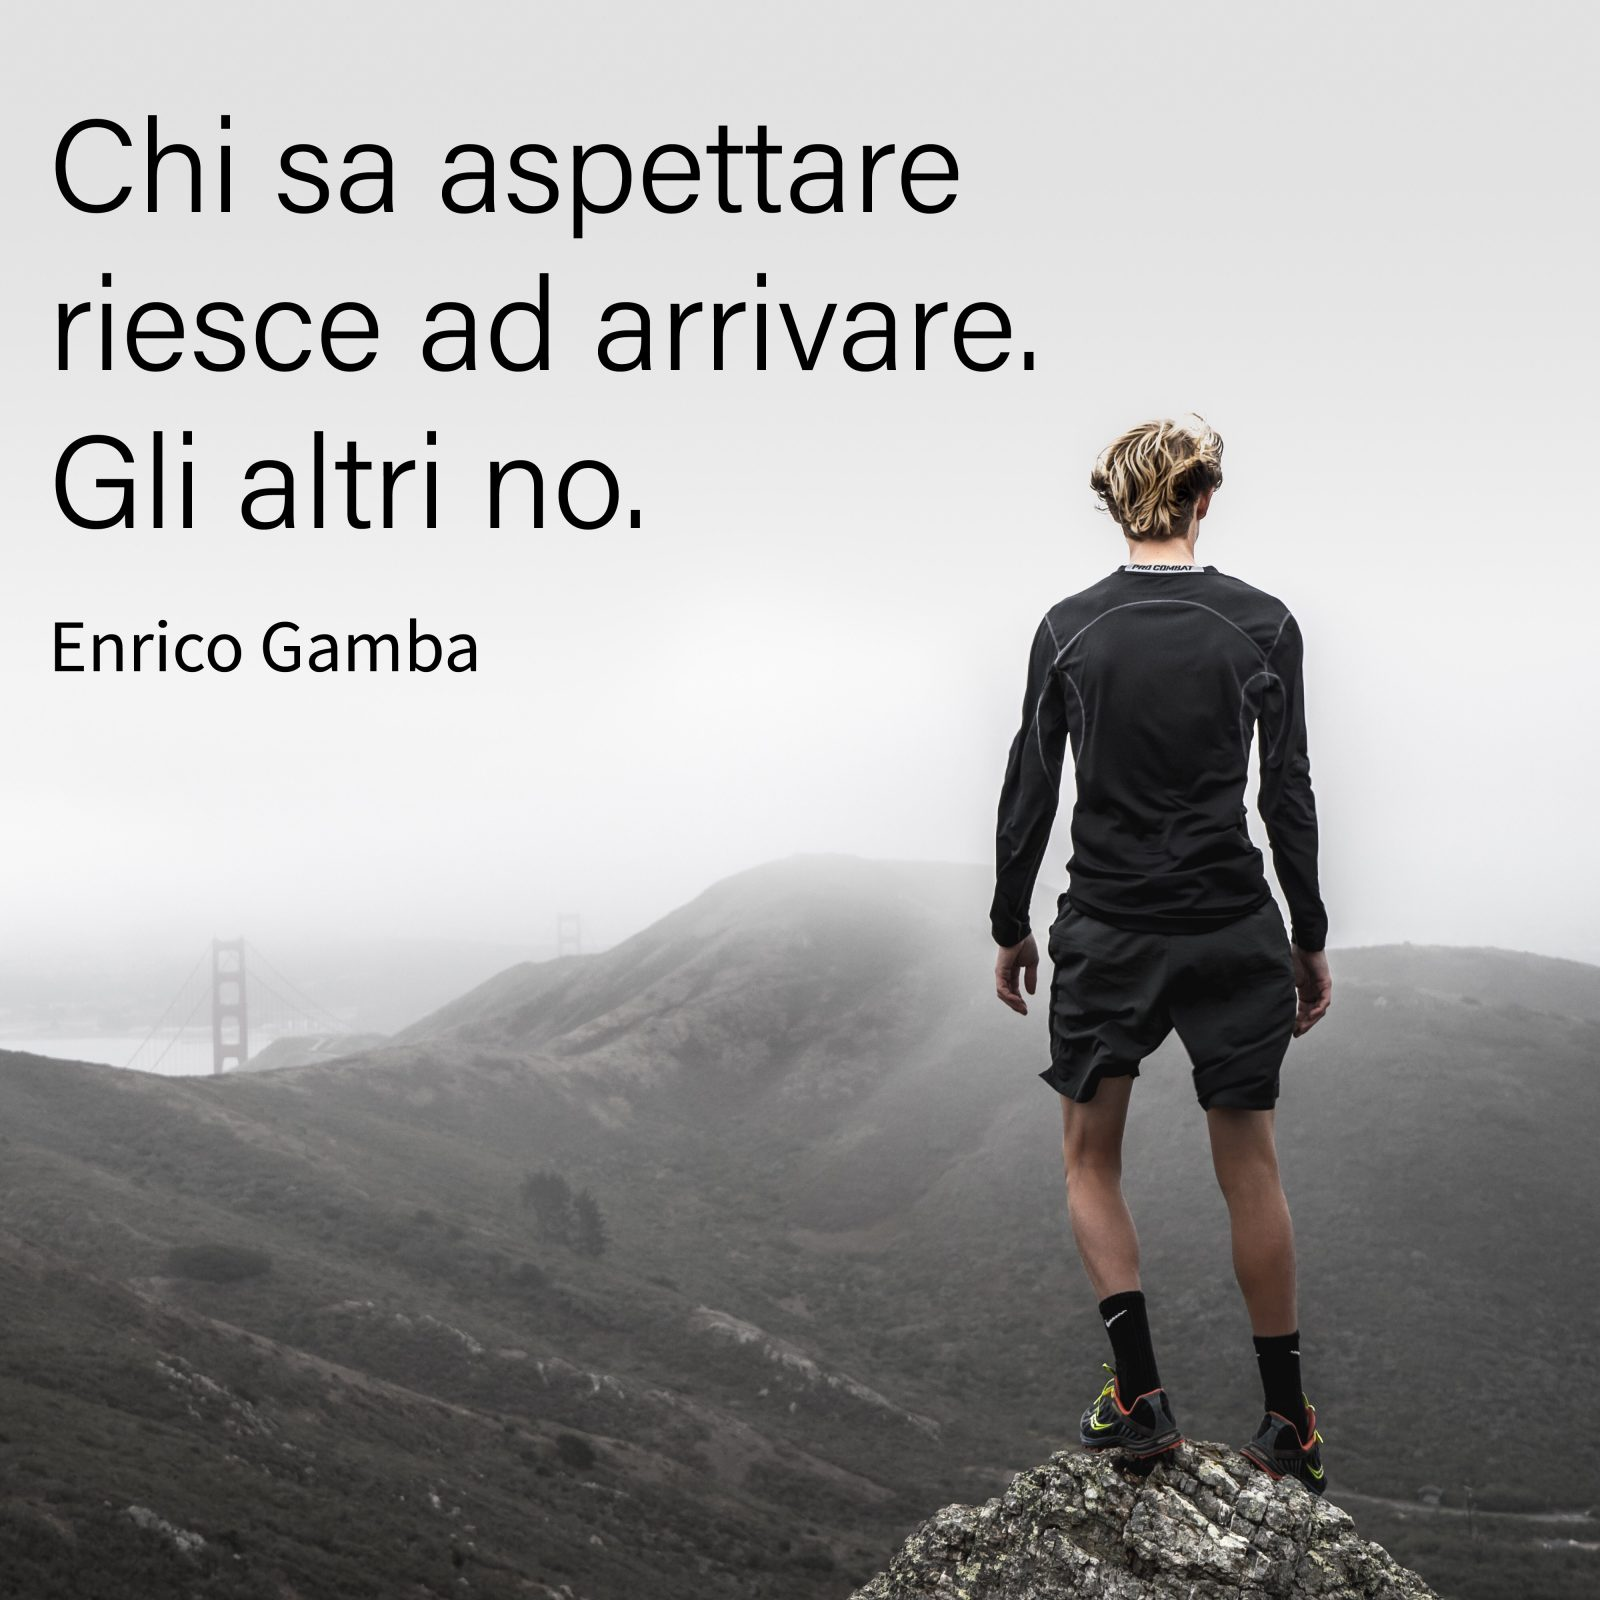 Successo - Enrico Gamba - Paicologo Milano